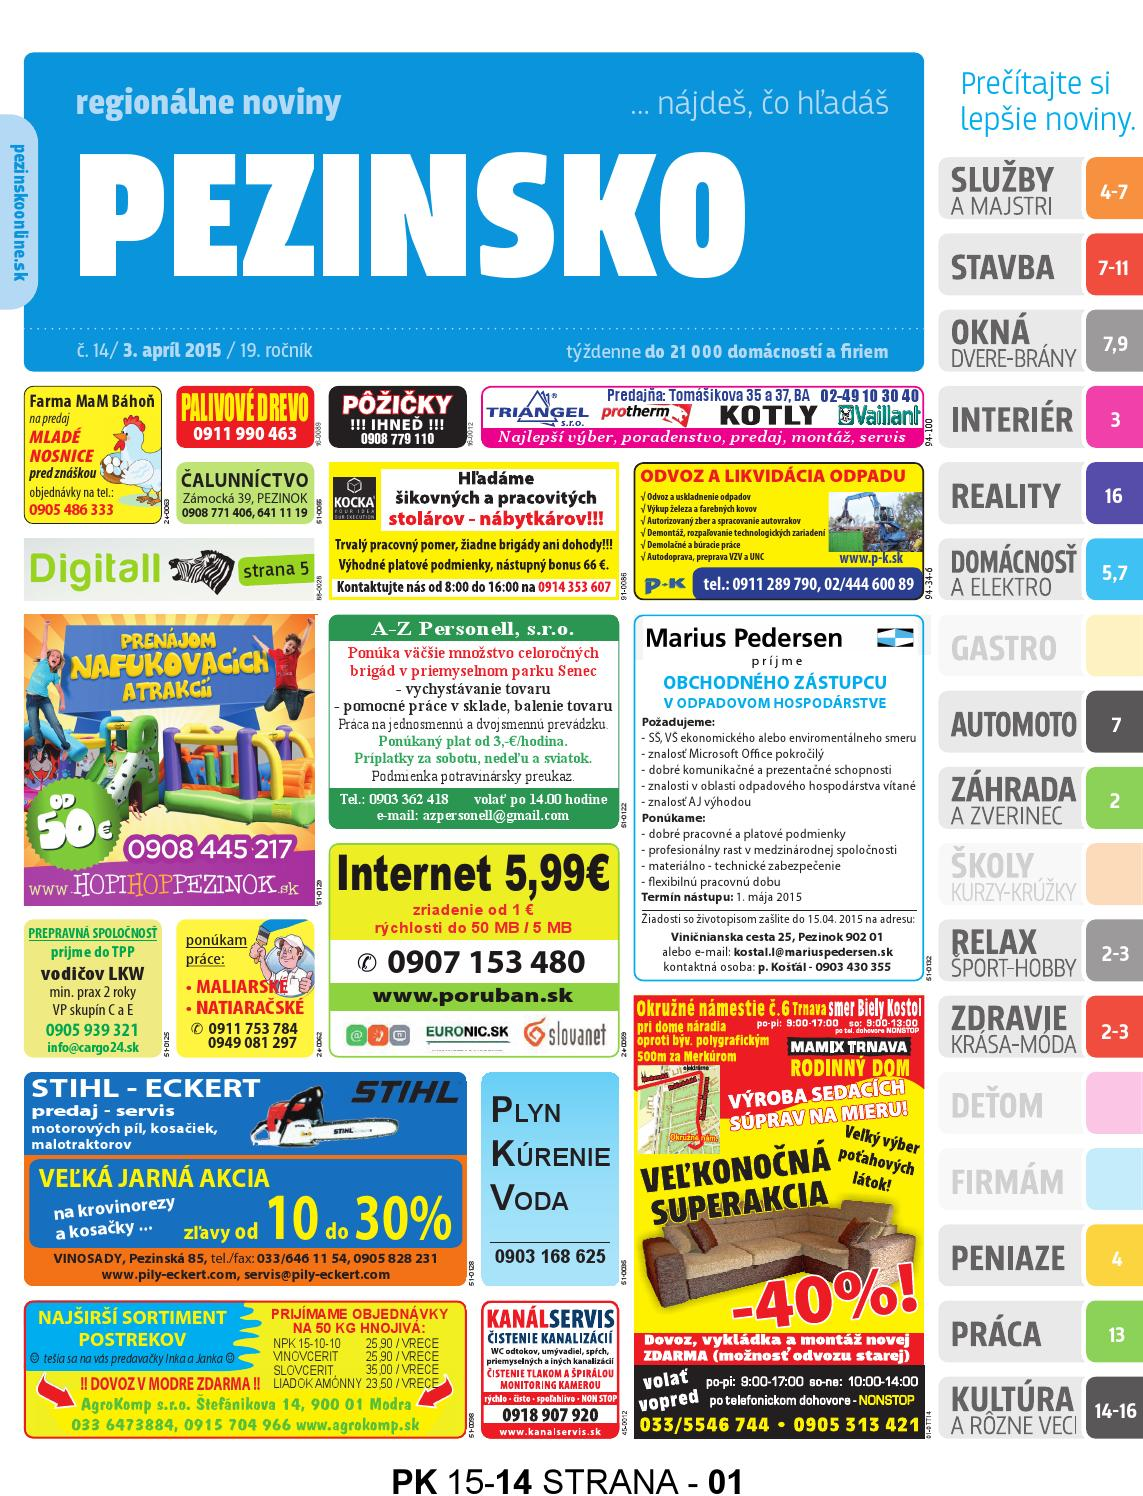 Česká republika datovania